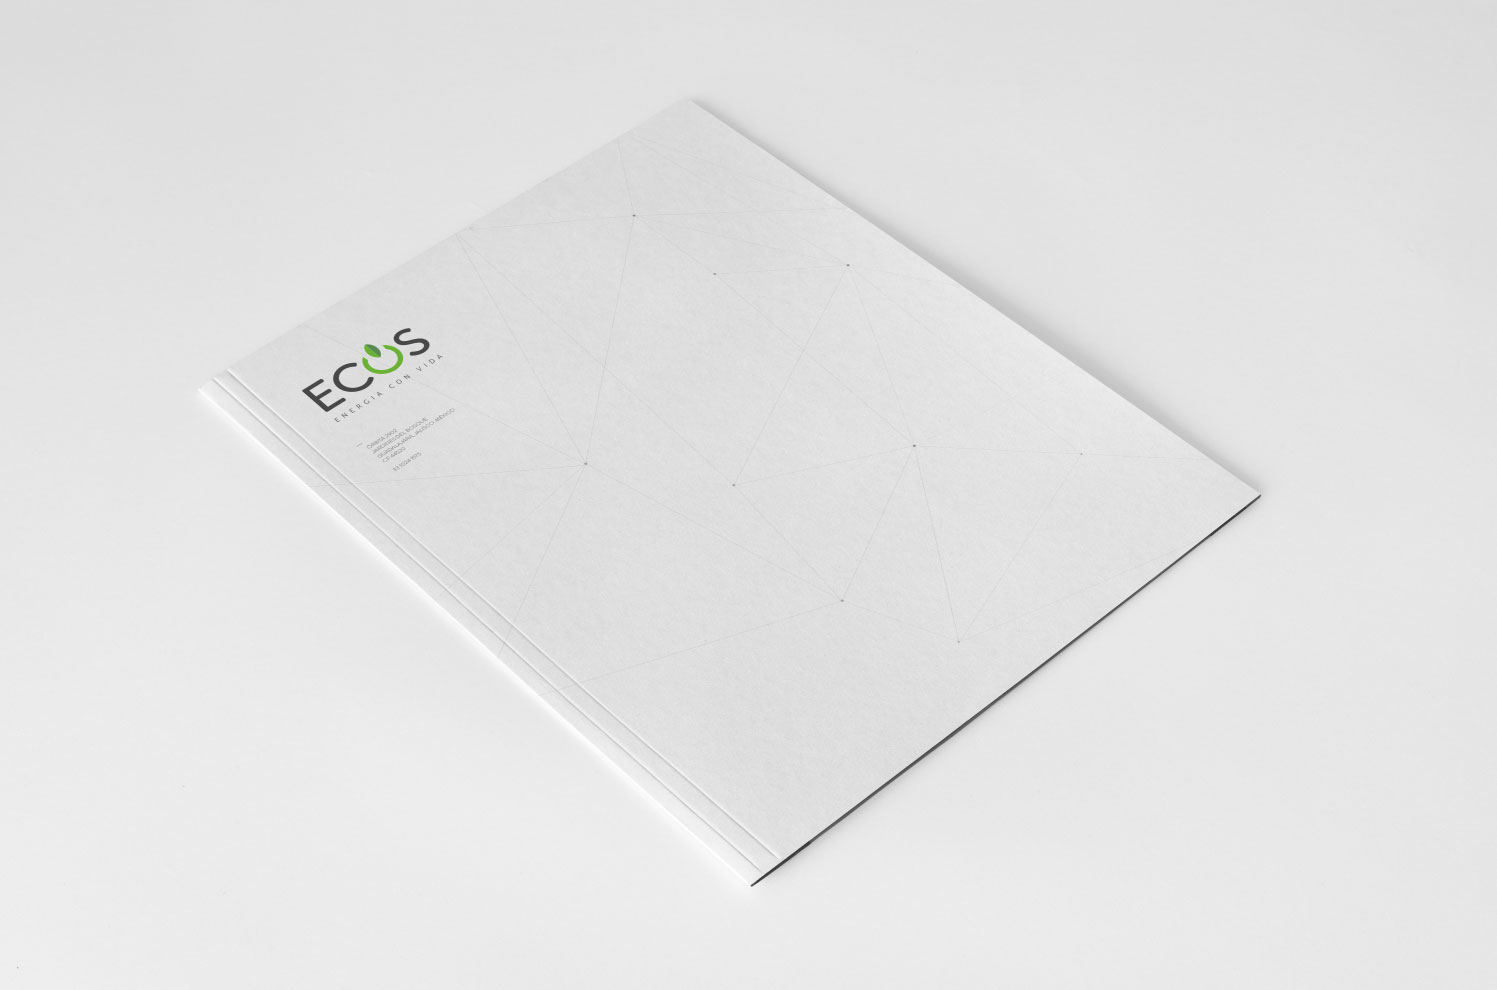 identidad-corporativa-folder-logotipo-ecos